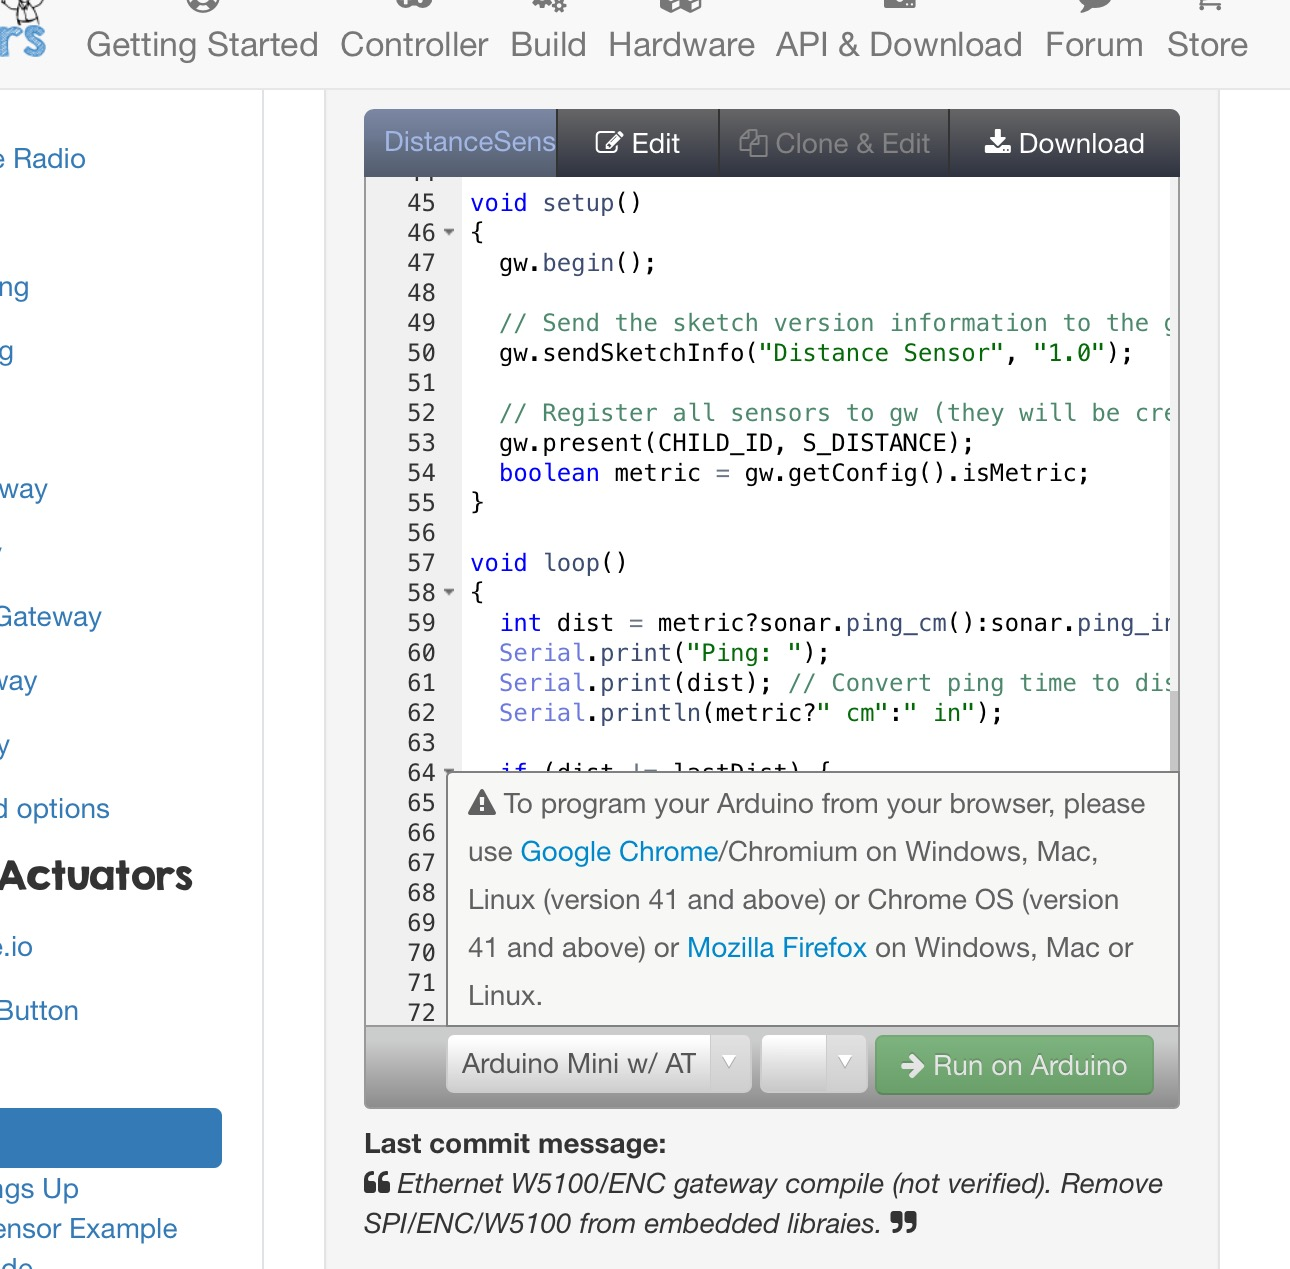 Codebender on ipad hiding code | MySensors Forum